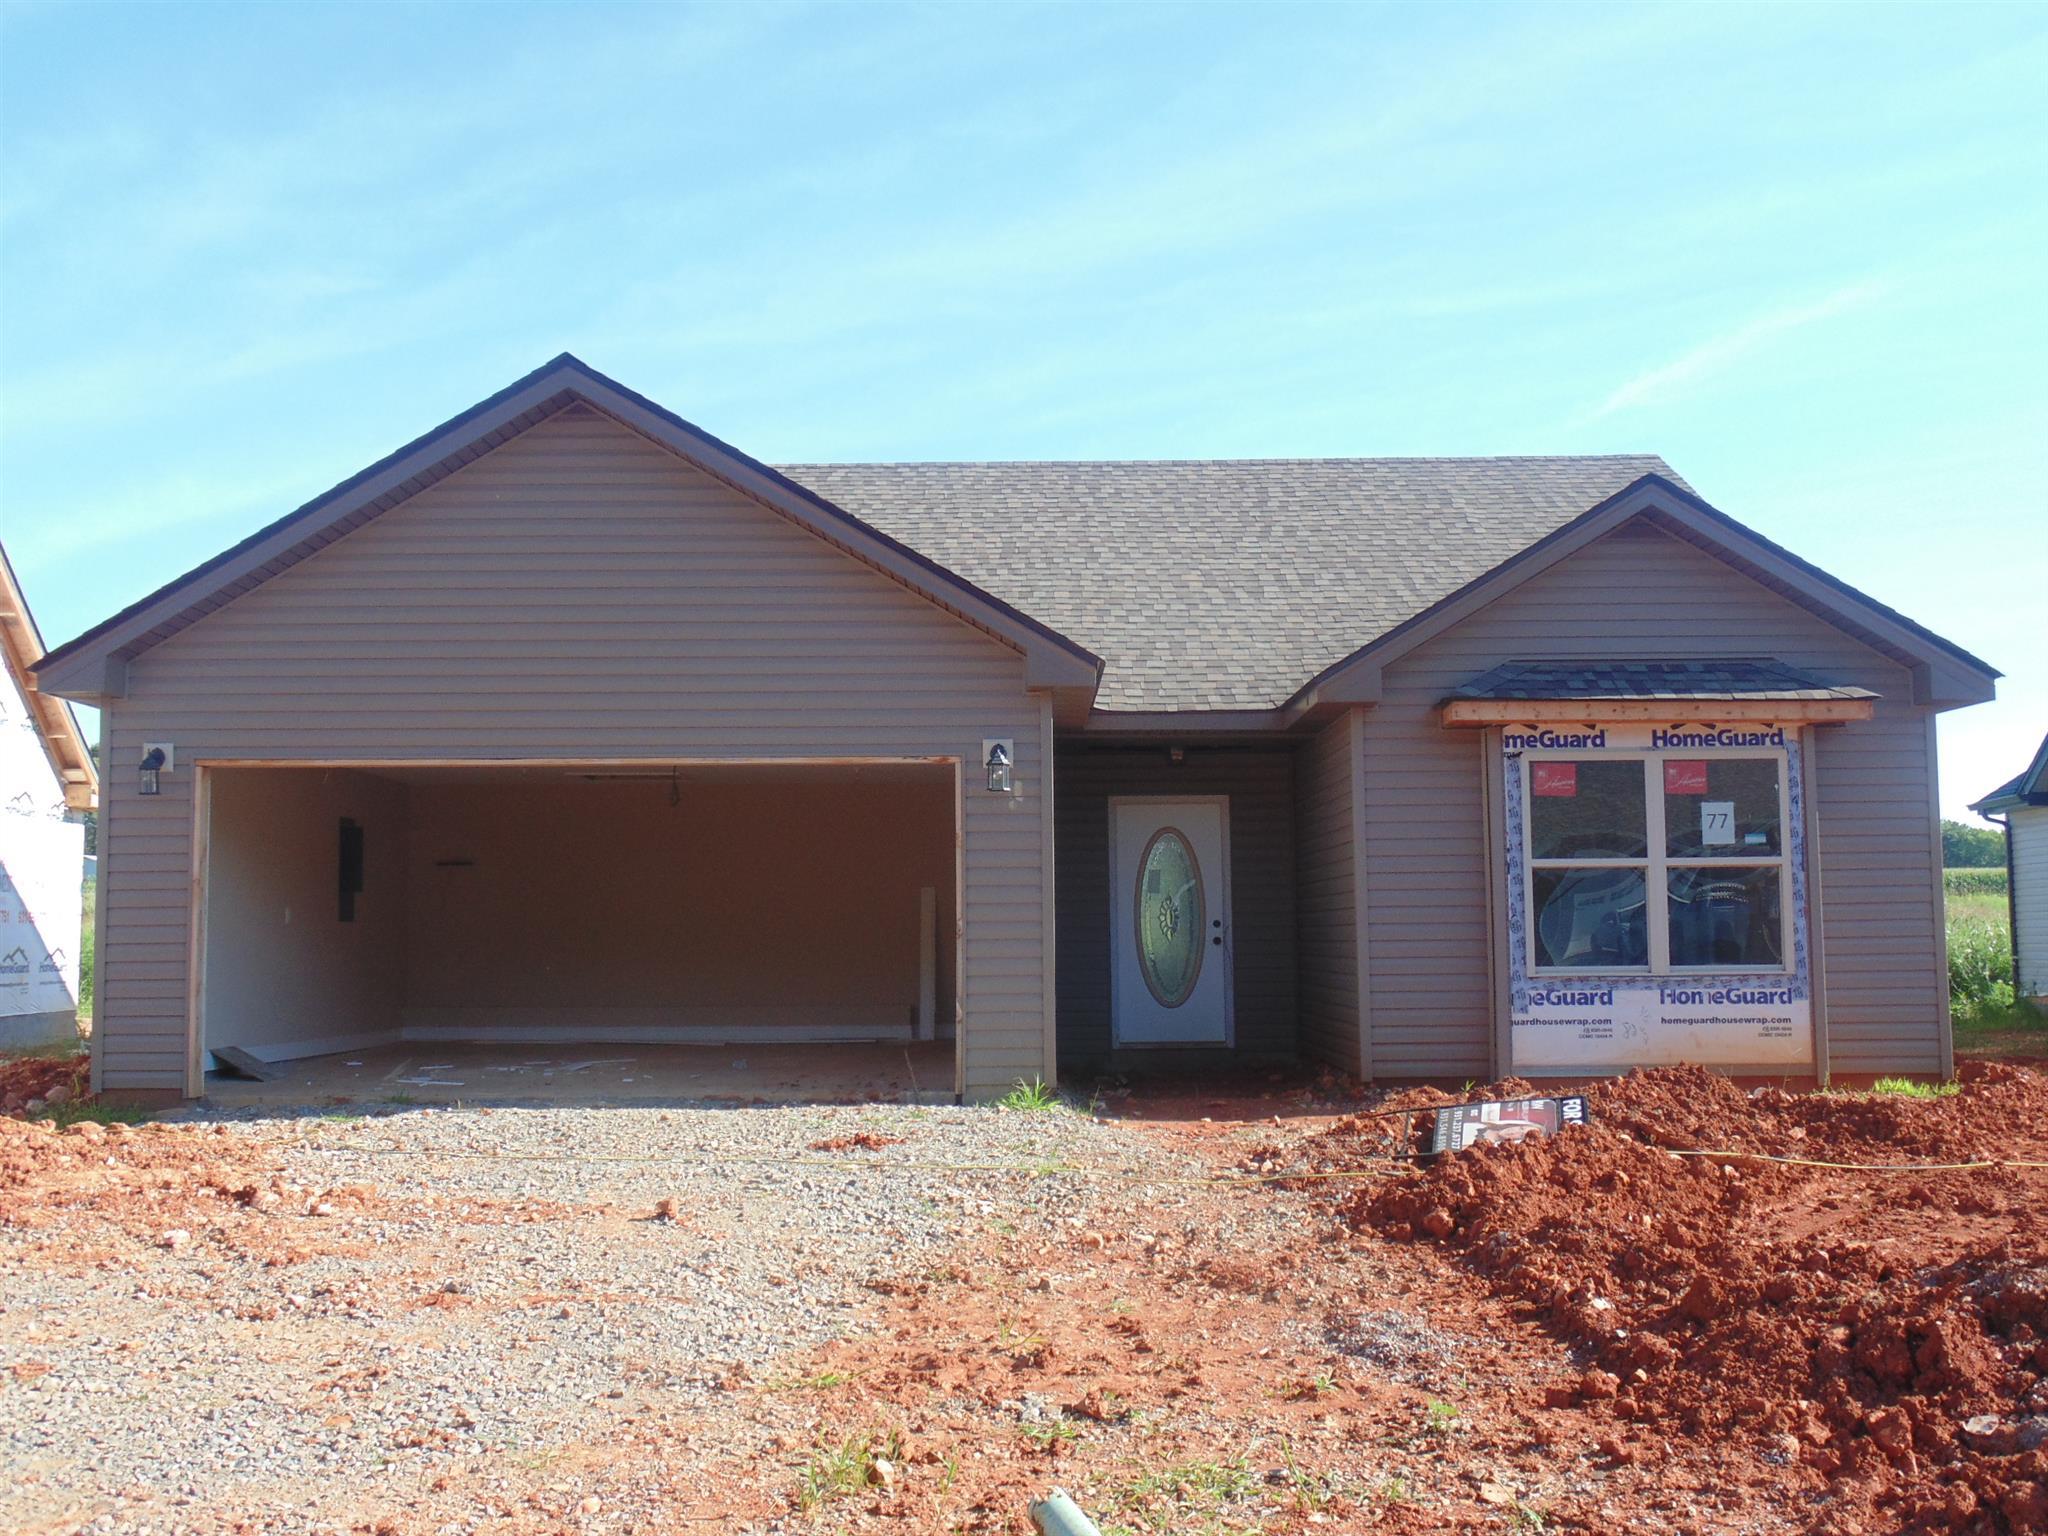 77 Rose Edd, Oak Grove, KY 42262